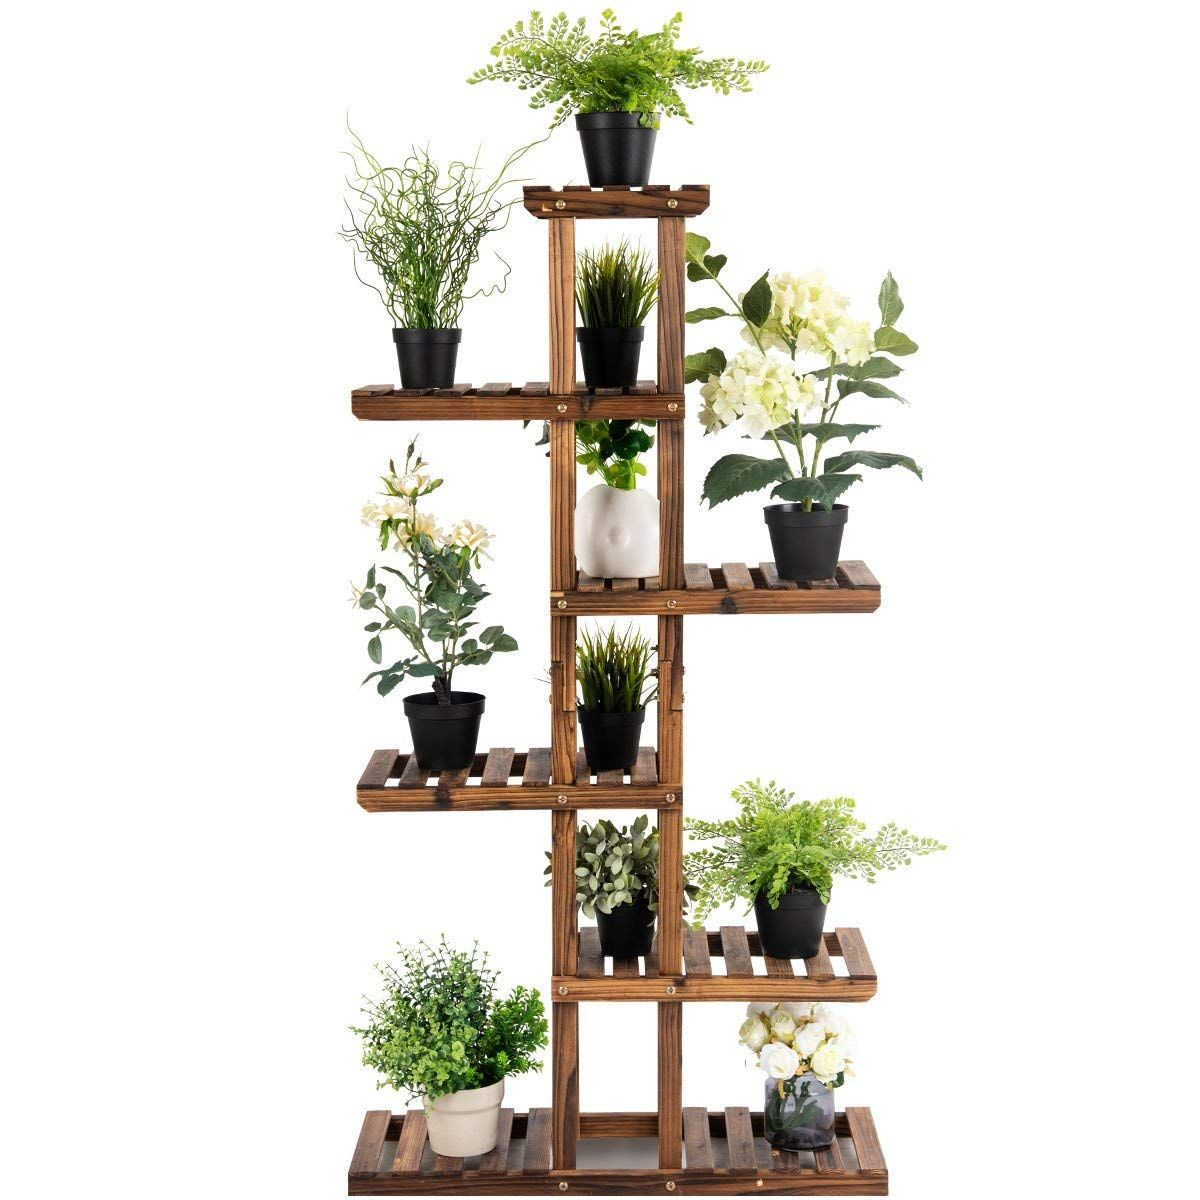 Flower Rack Wood Plant Stand 7 Wood Shelves 11 Pots Bonsai Display Shelf Amazon Com Giantex Indoor Ou Flower Display Wood Plant Stand Plant Shelves